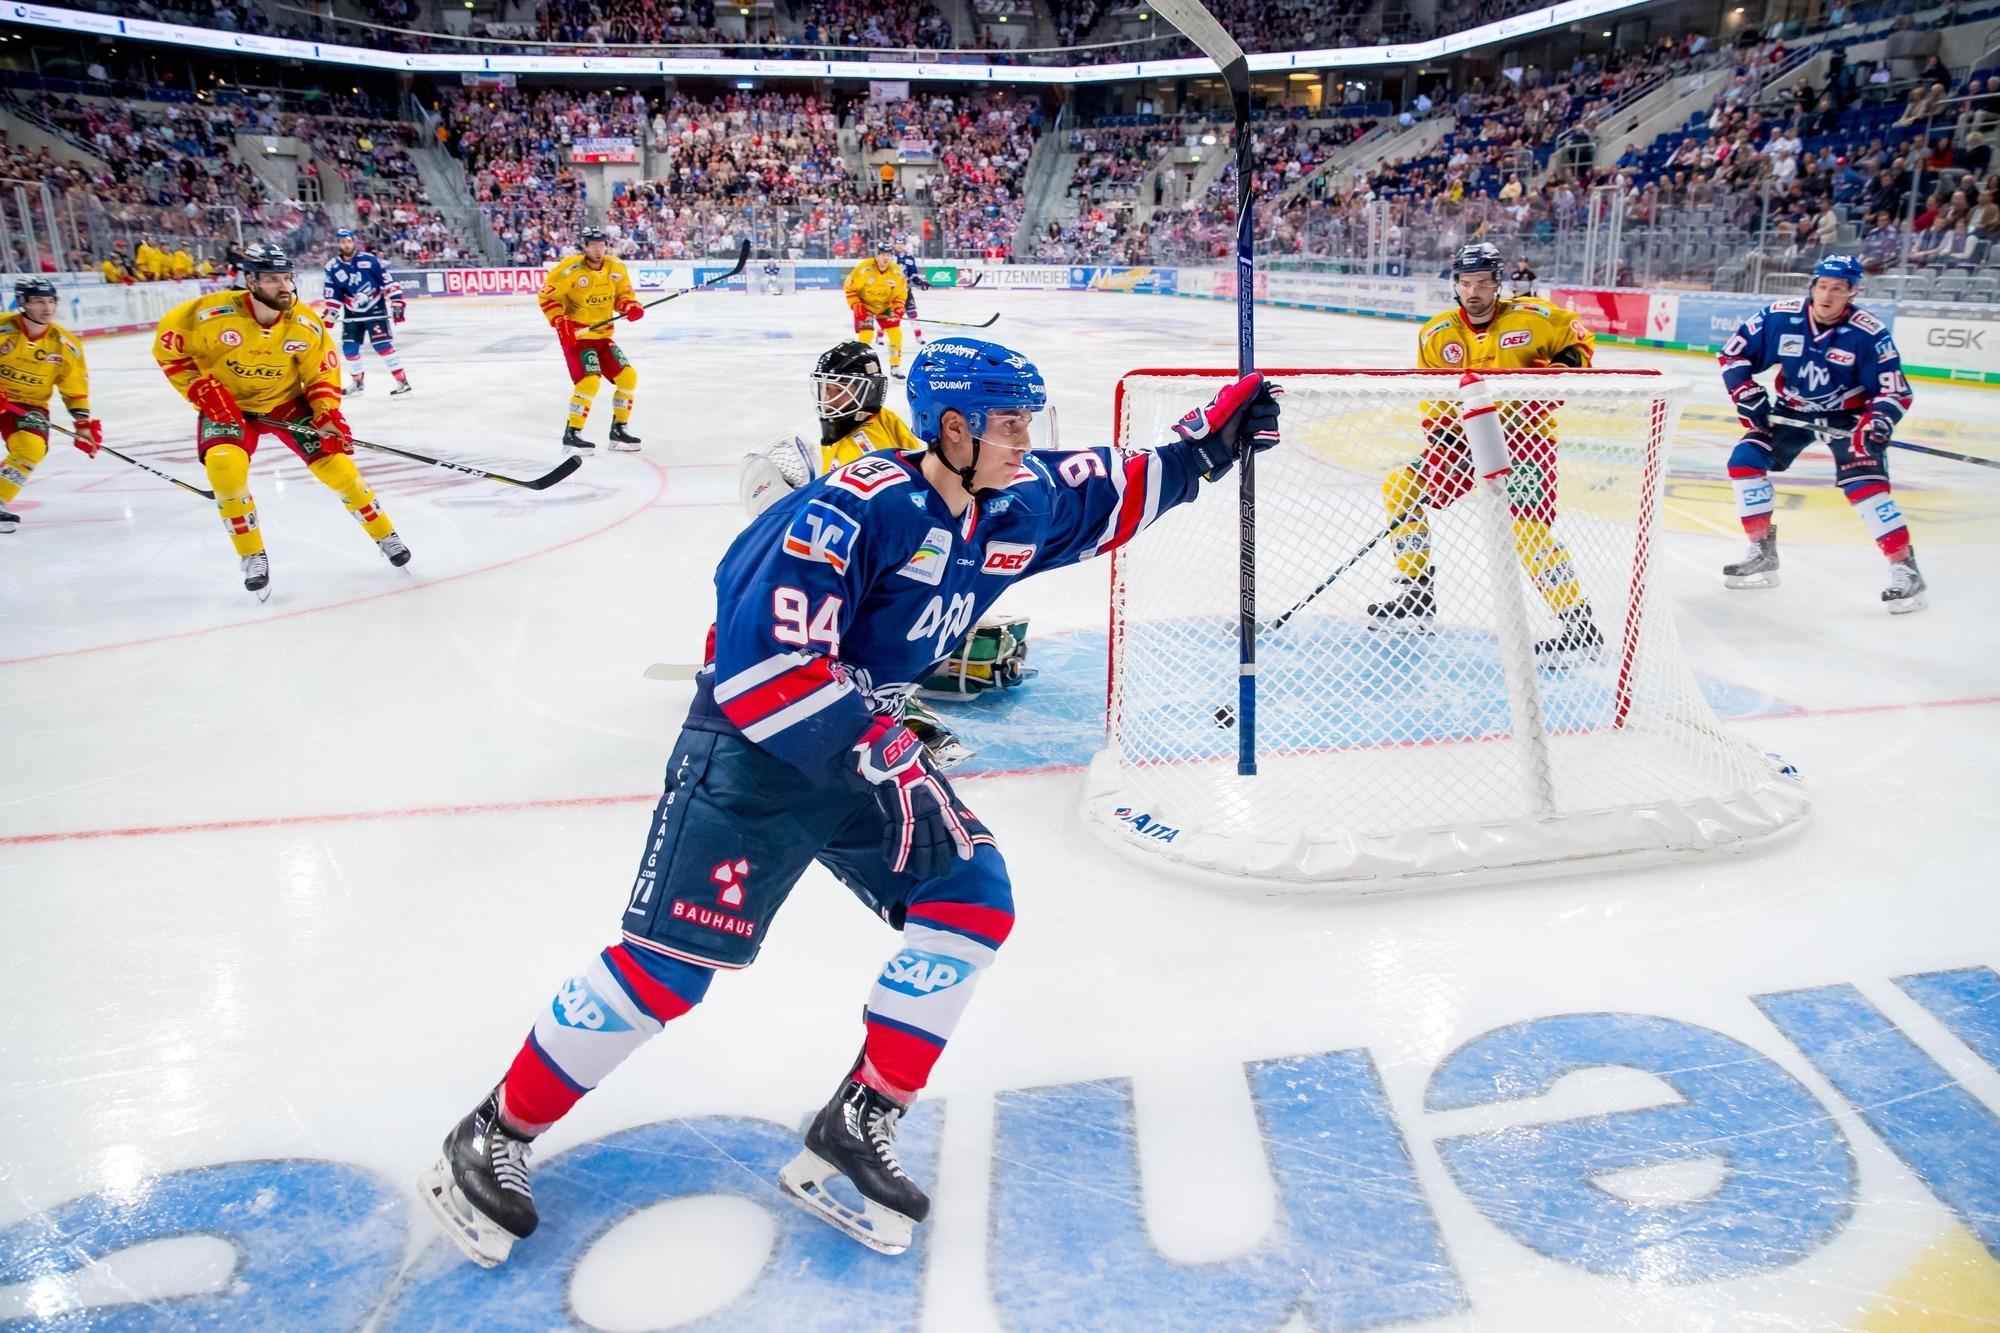 Trainingstrikot Steel Weiss -Eishockey Inlinehocky